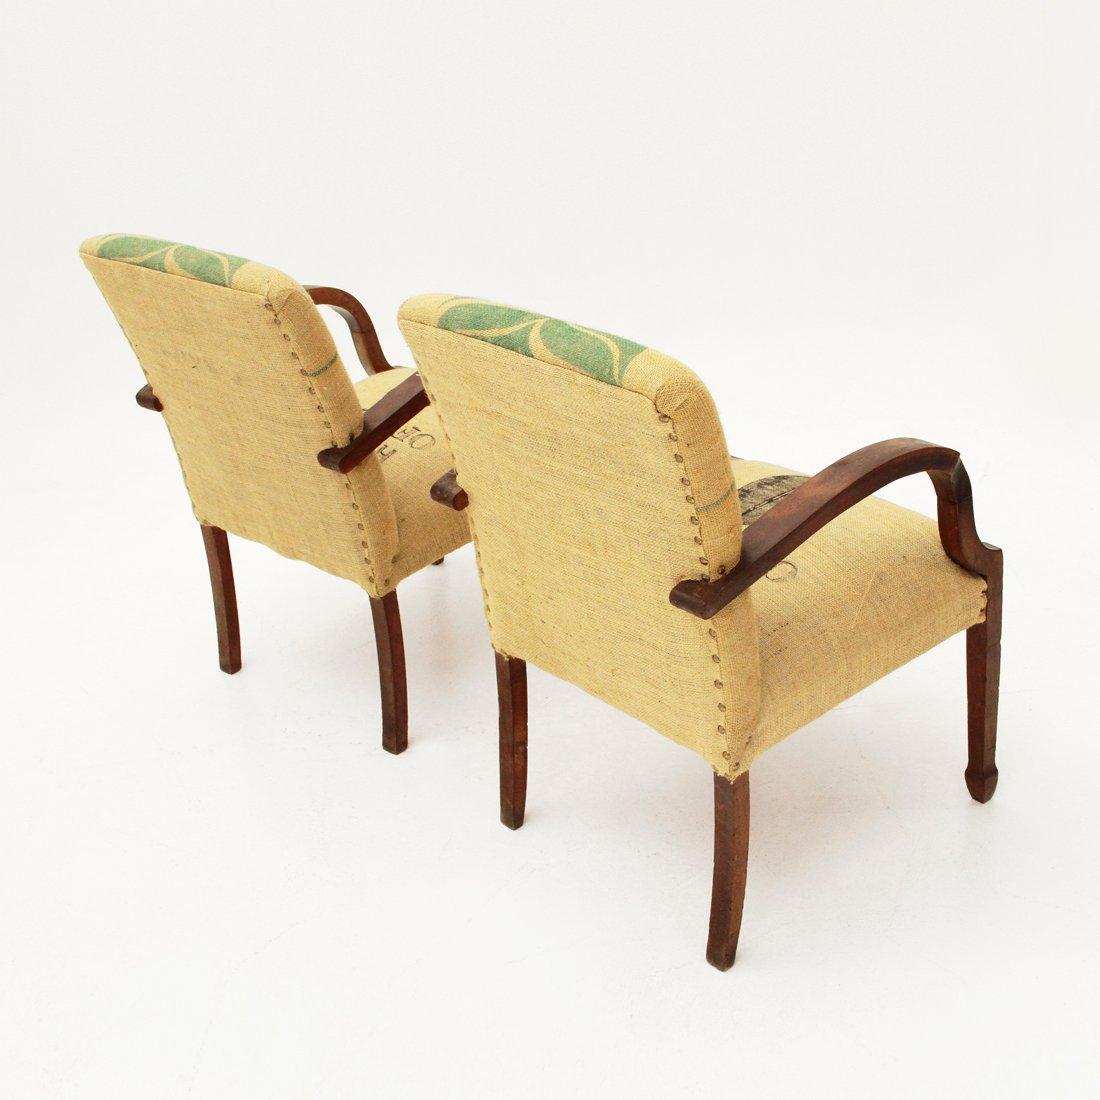 Italian Jute Easy Chairs, 1940s, Set Of 2